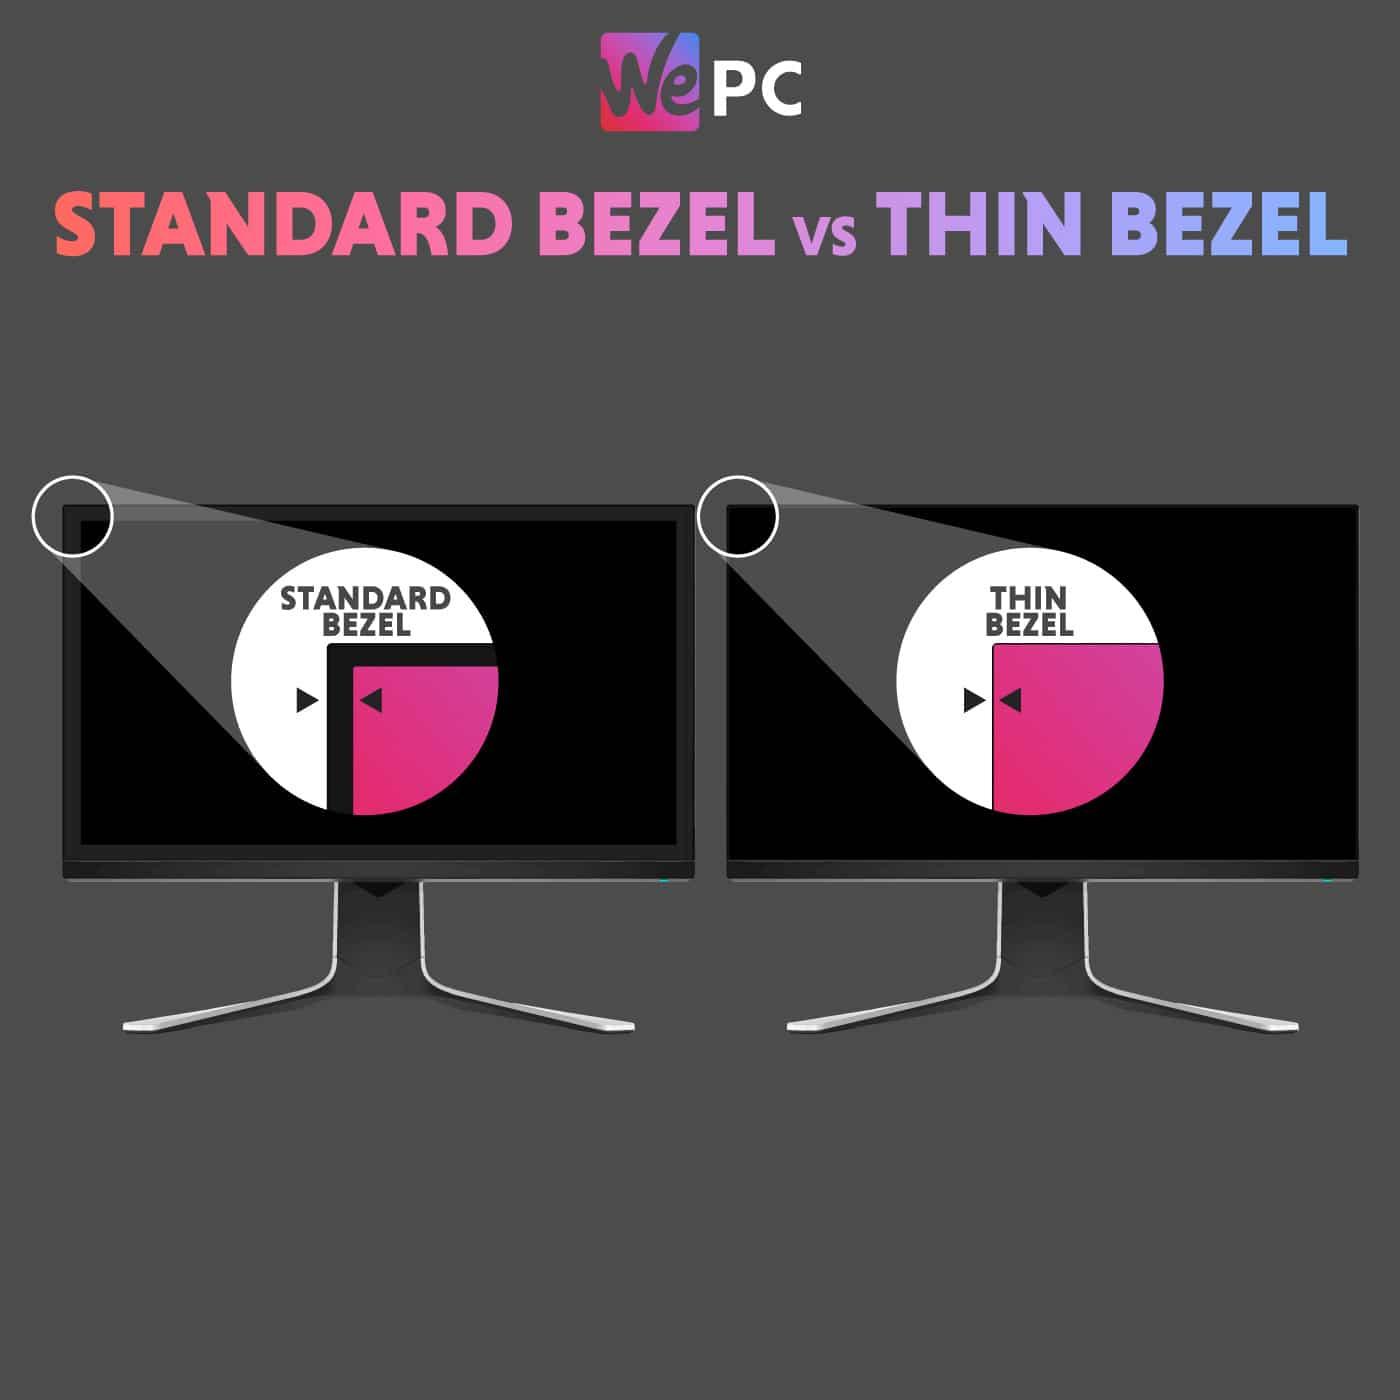 Monitor Standard Bazel vs Thin Bazel